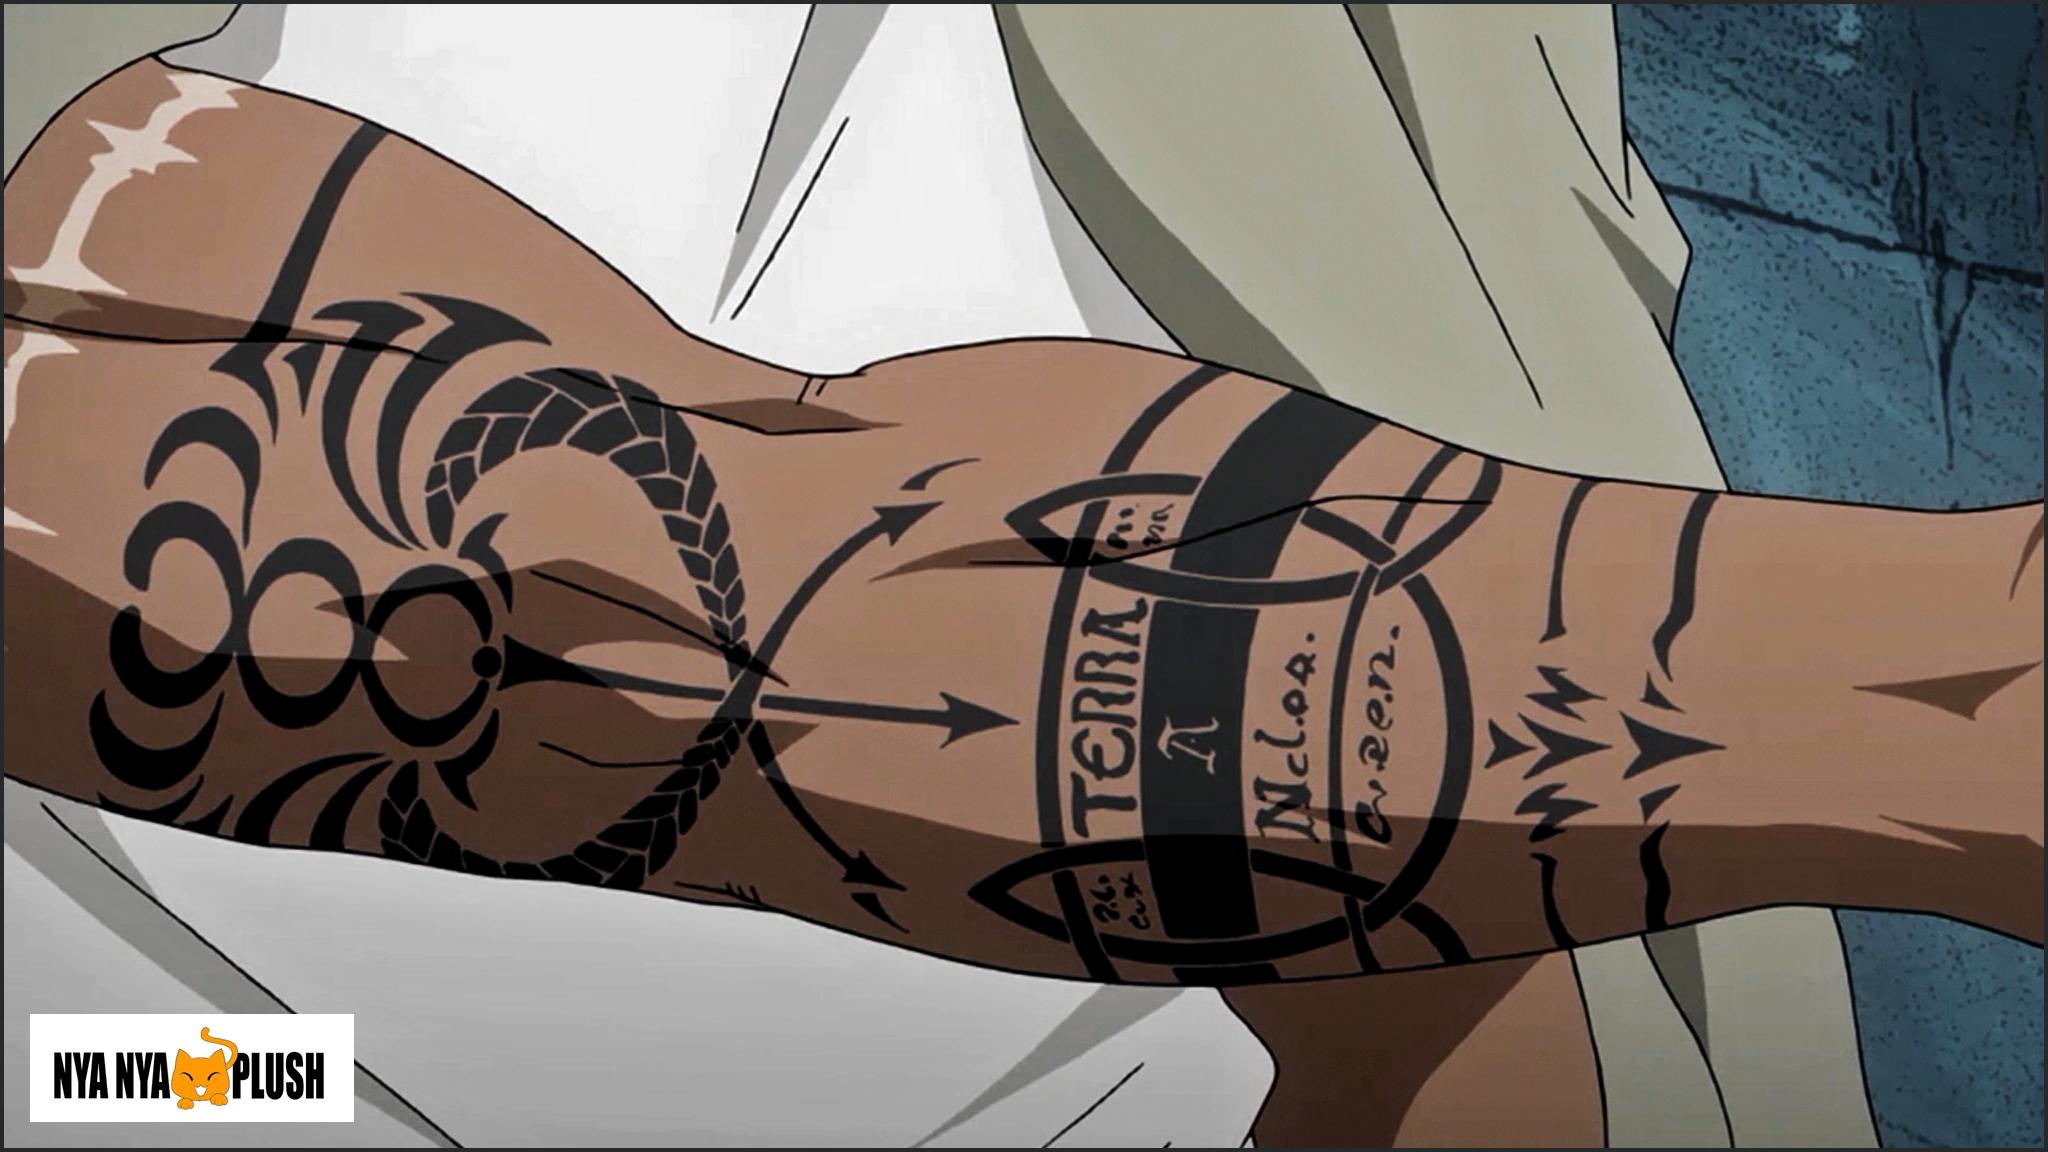 Fullmetal Alchemist Brotherhood - Scar's Right Arm by Nya-Nya-Plush on DeviantArt